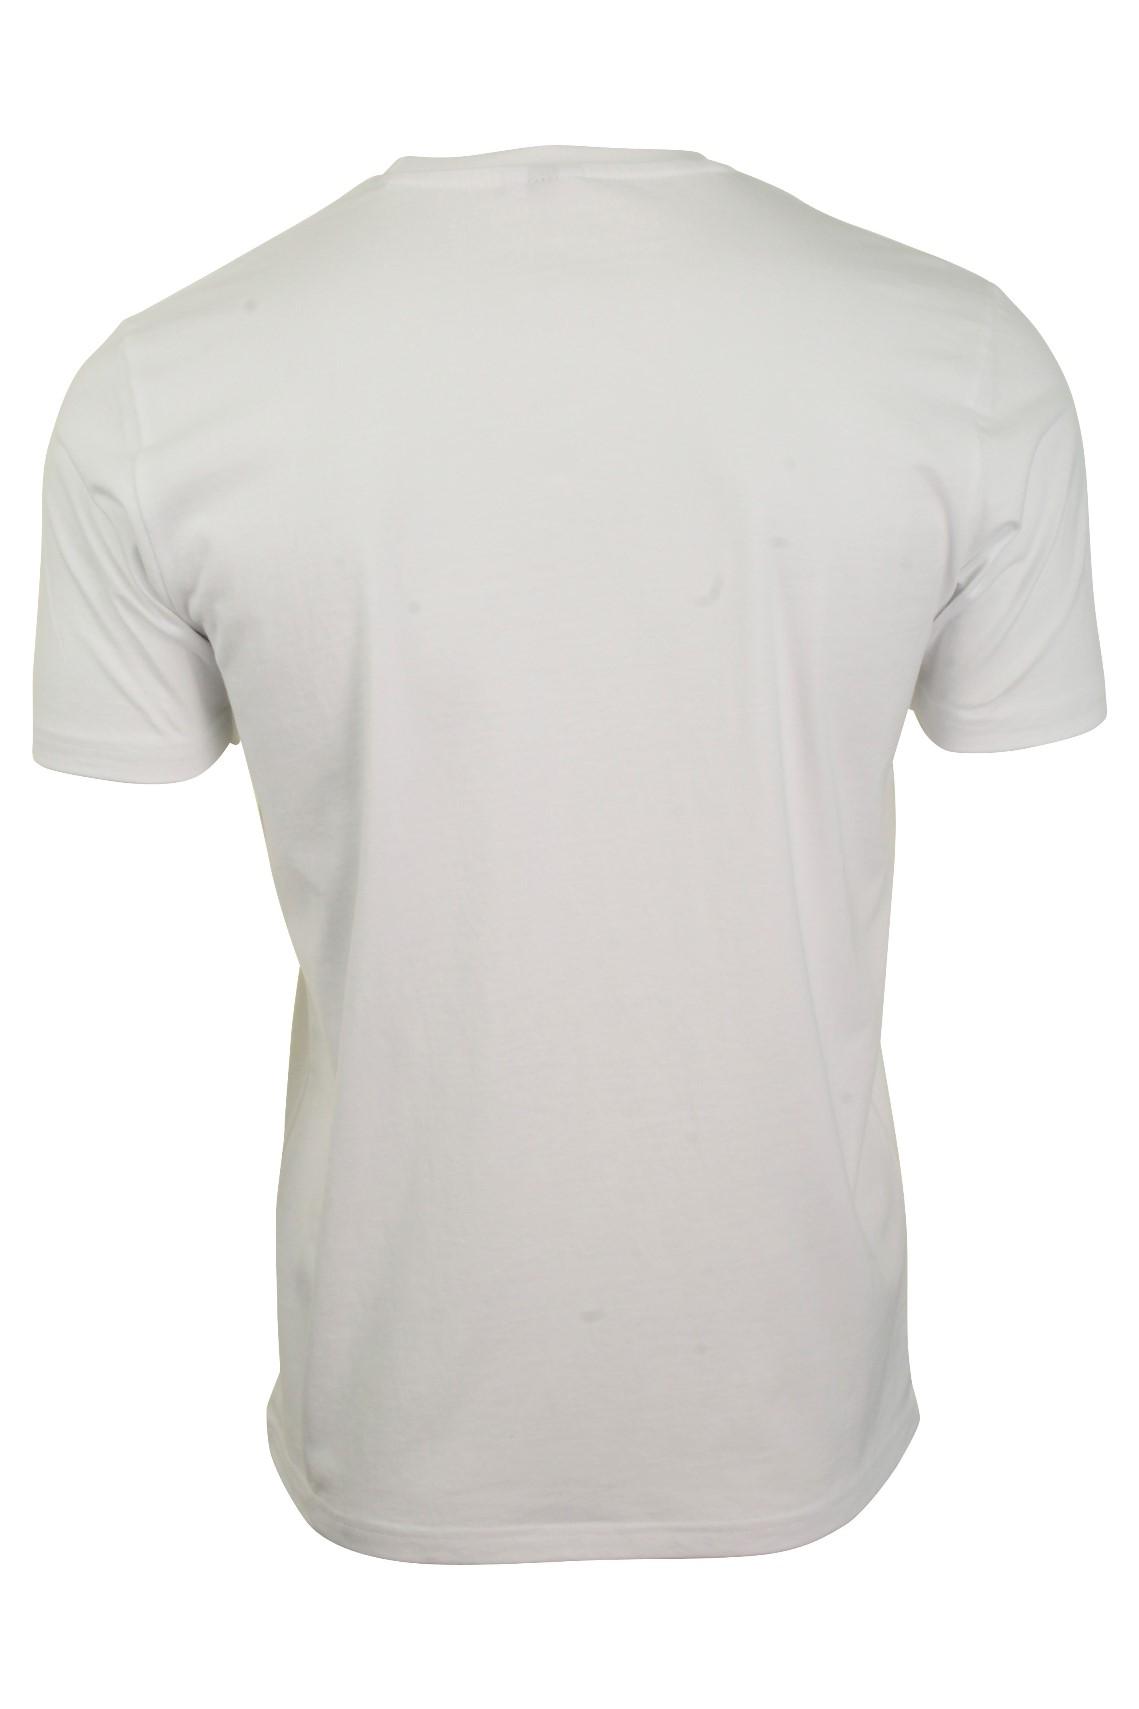 Para-Hombre-Ellesse-Camiseta-de-manga-corta-039-Canaletto-034 miniatura 14